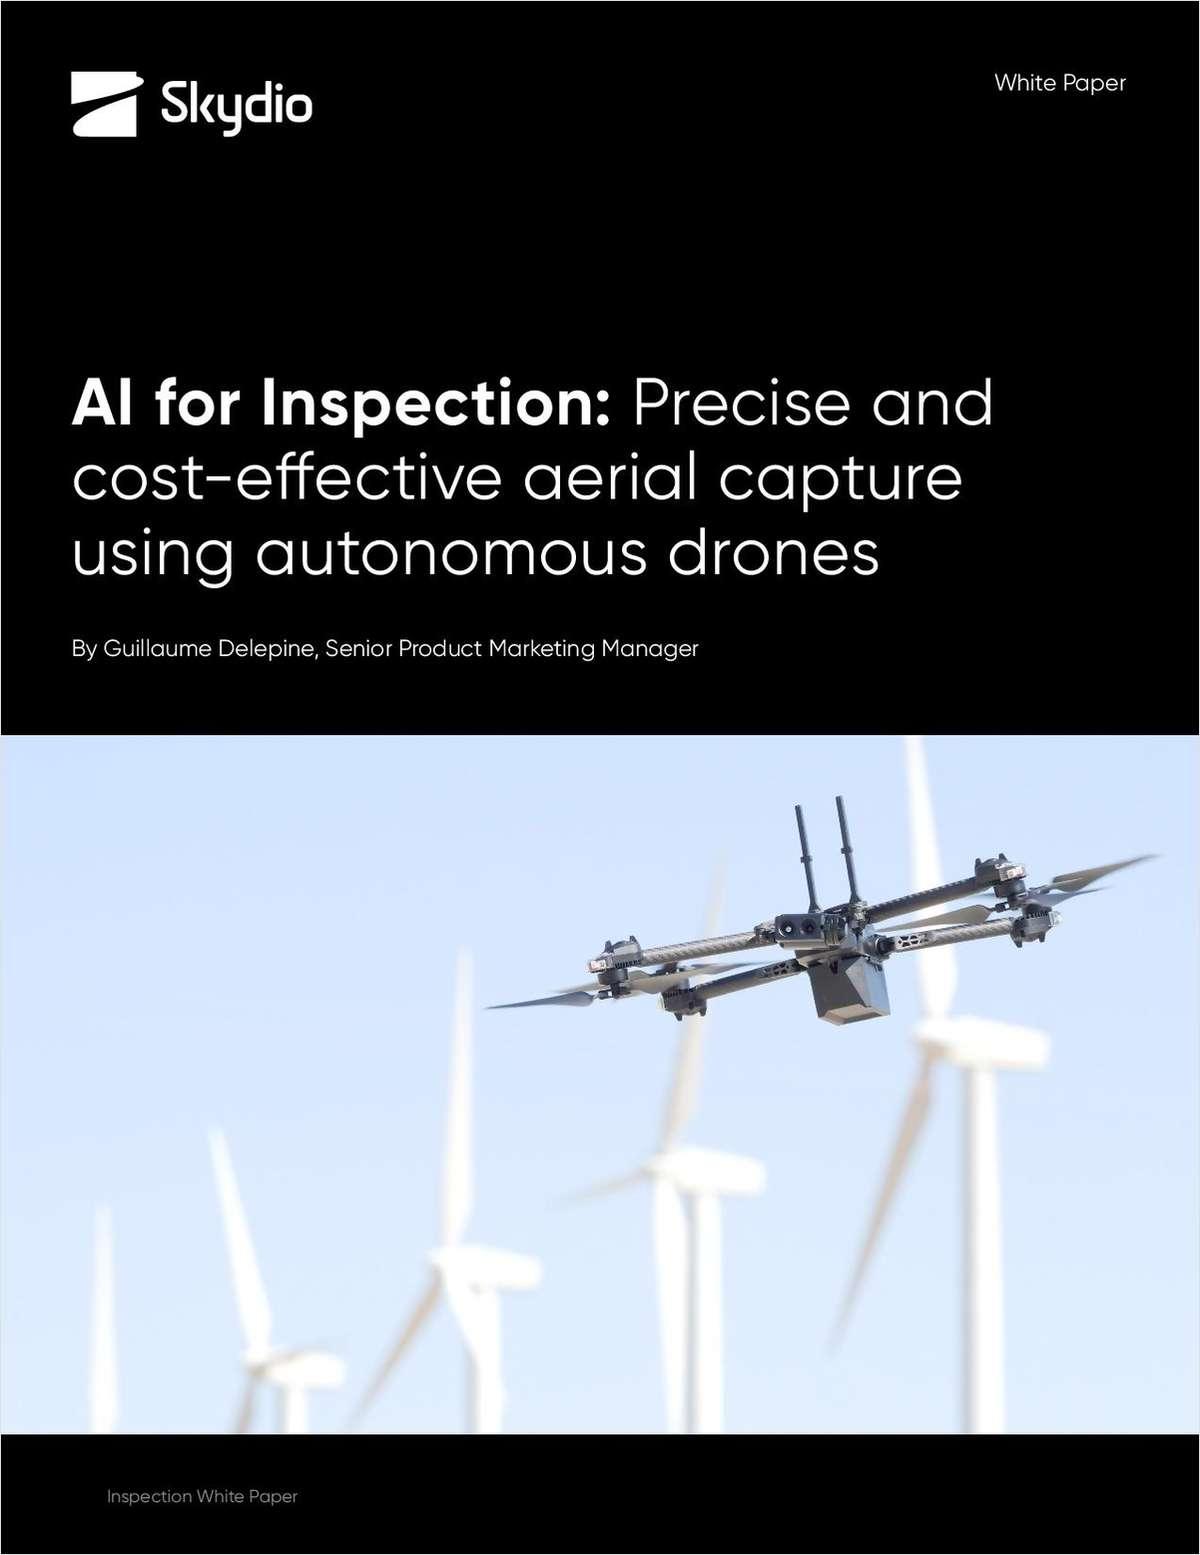 AI for Inspection: Precise and Cost-Effective Aerial Capture Using Autonomous Drones